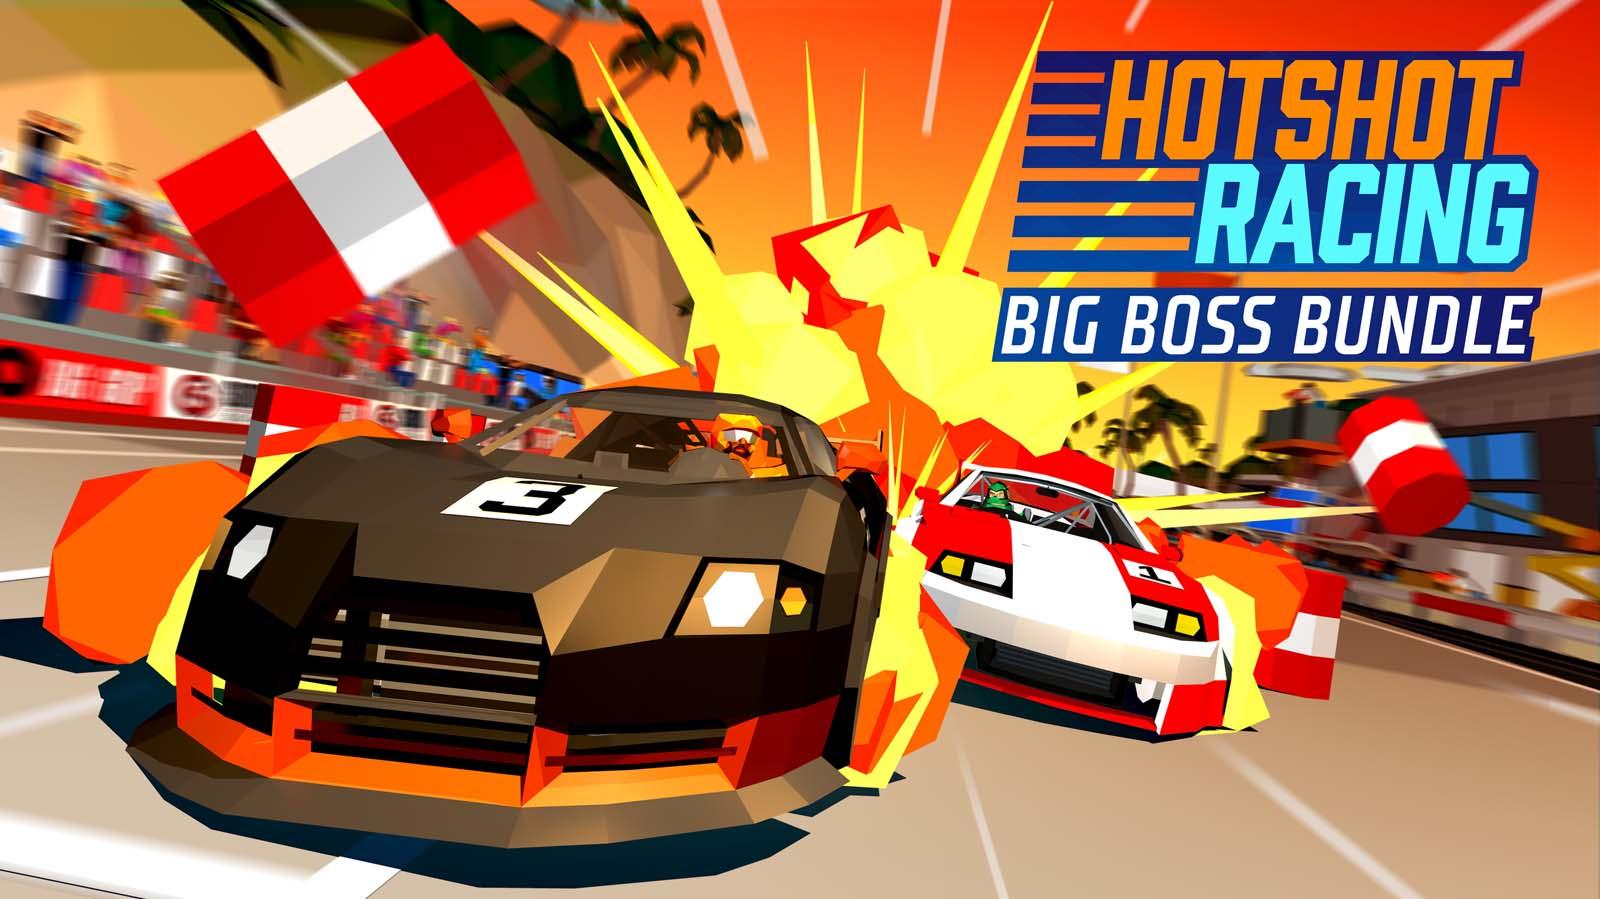 Hotshot Racing Free 'Big Boss DLC' Out Today Brings New Championship, Tracks and More